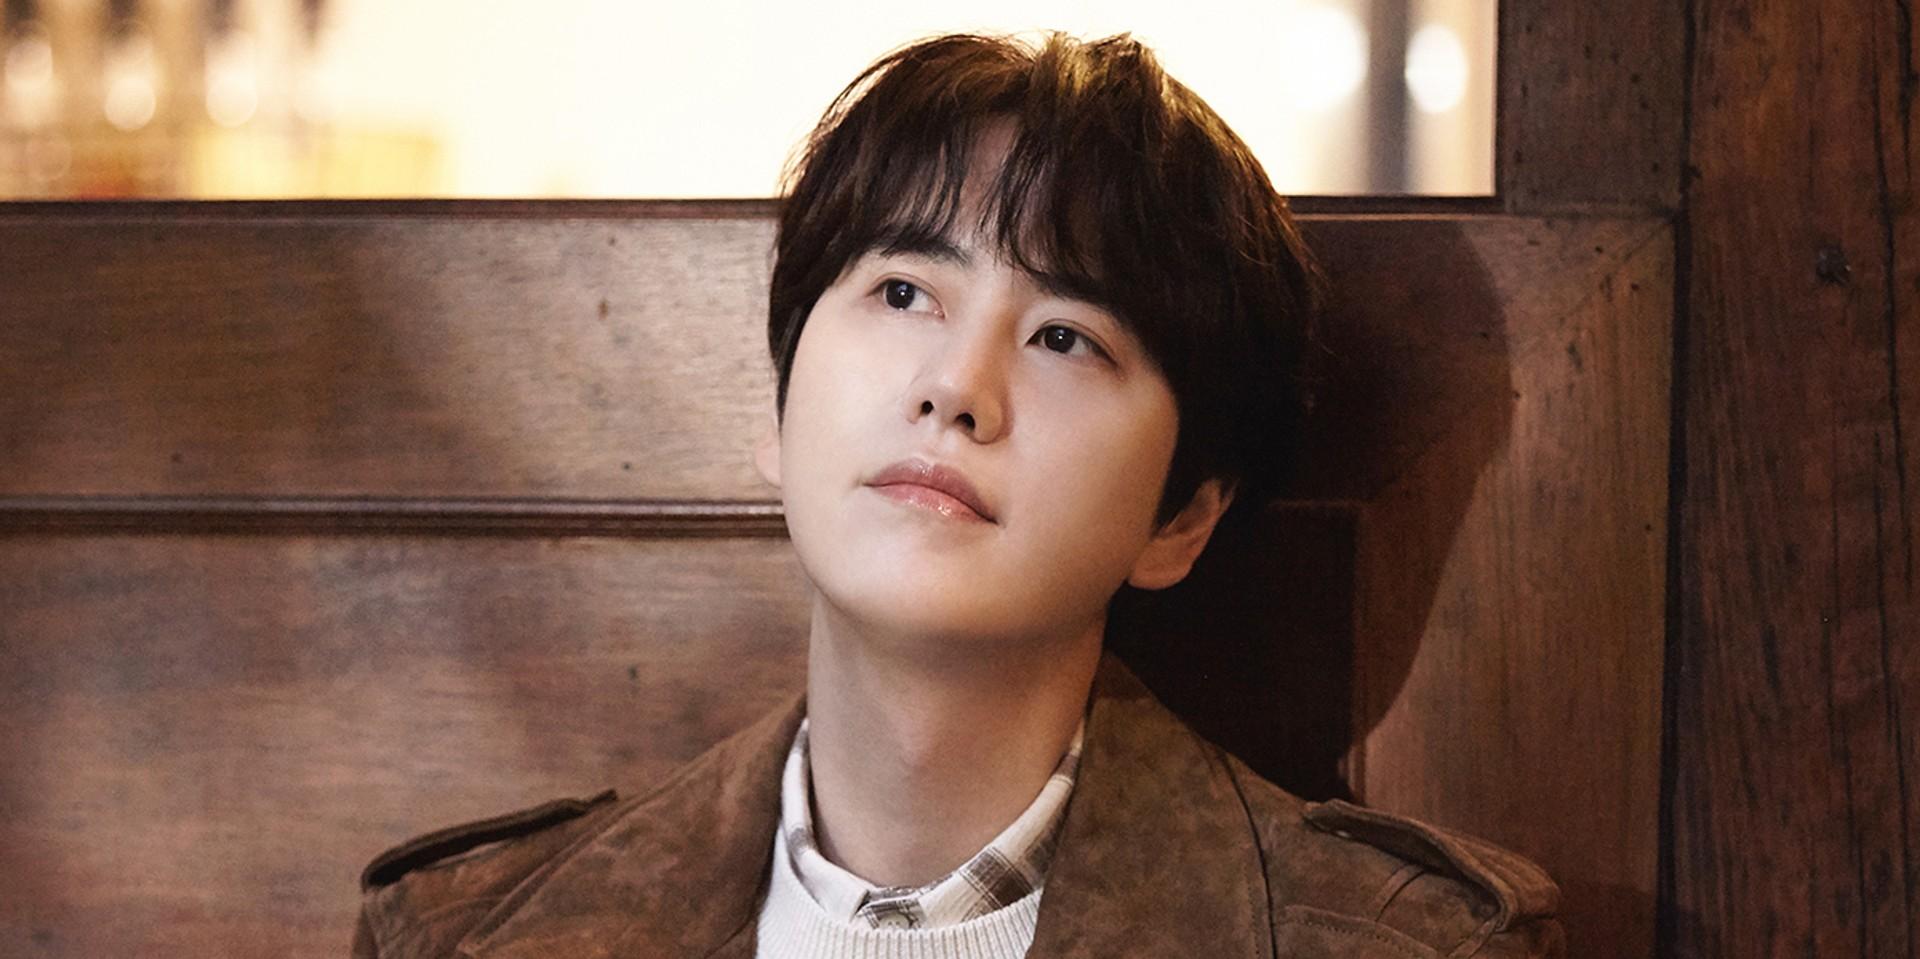 SUPER JUNIOR's Kyuhyun drops sweet new single 'Coffee' – listen